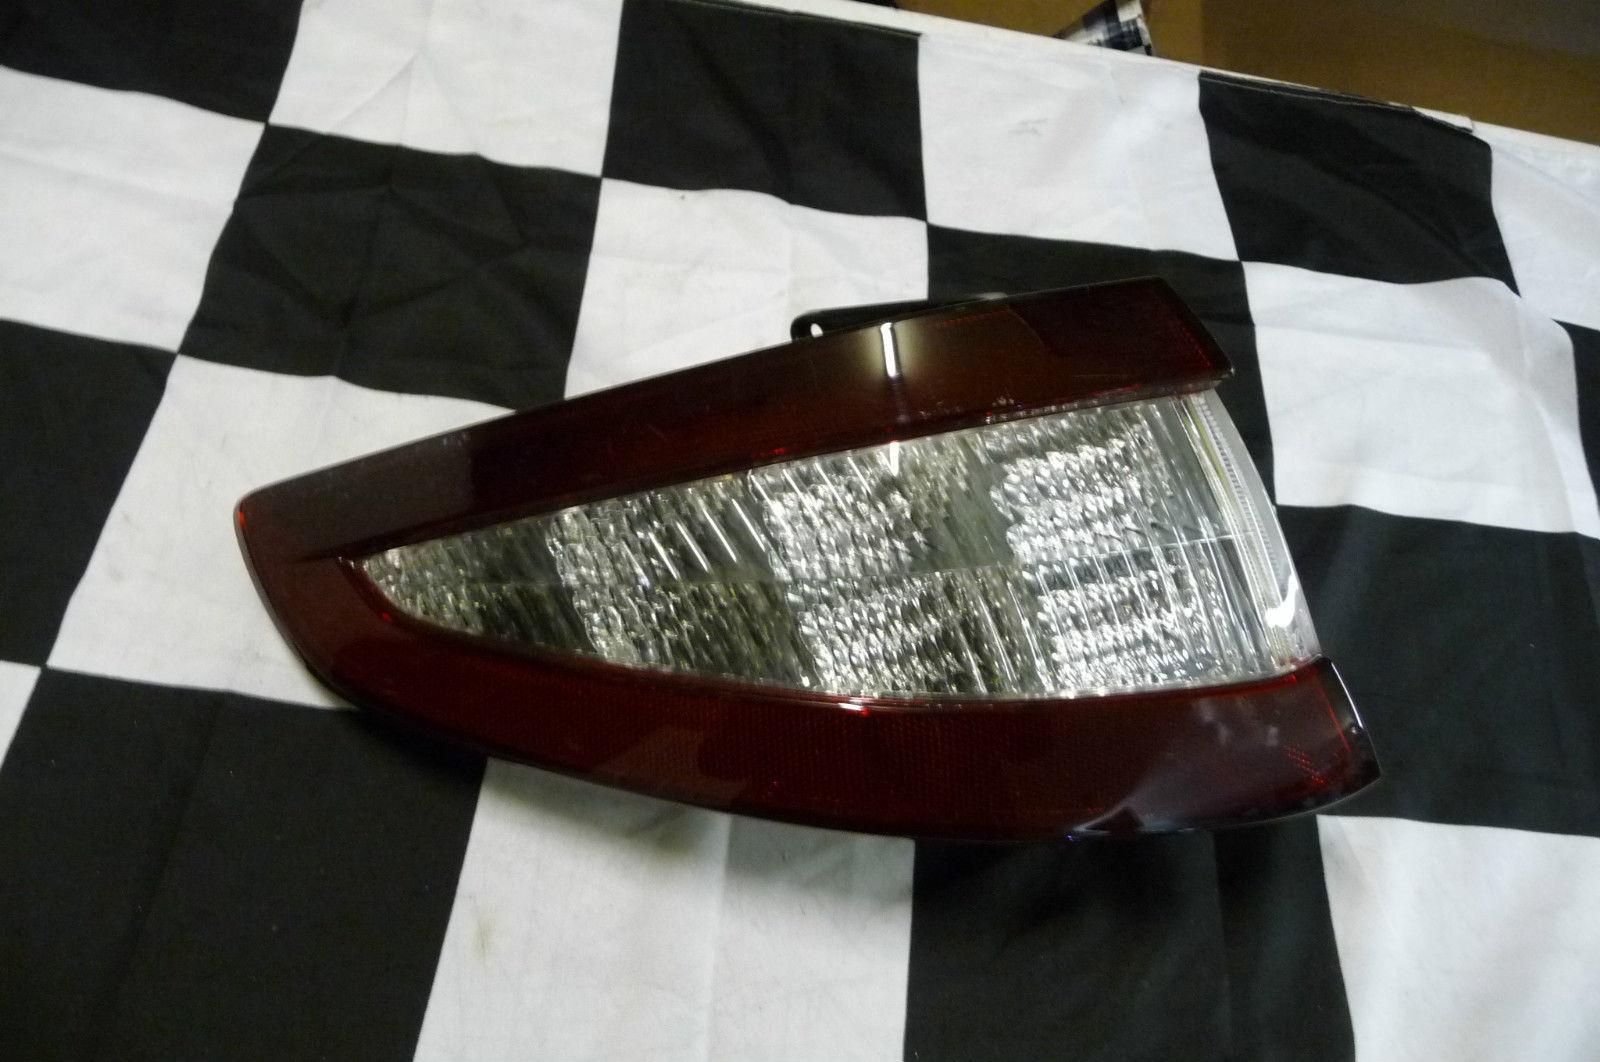 Maserati GranTurismo Driver side Left Tail Light  Tinted 234379 - Used Auto Parts Store | LA Global Parts